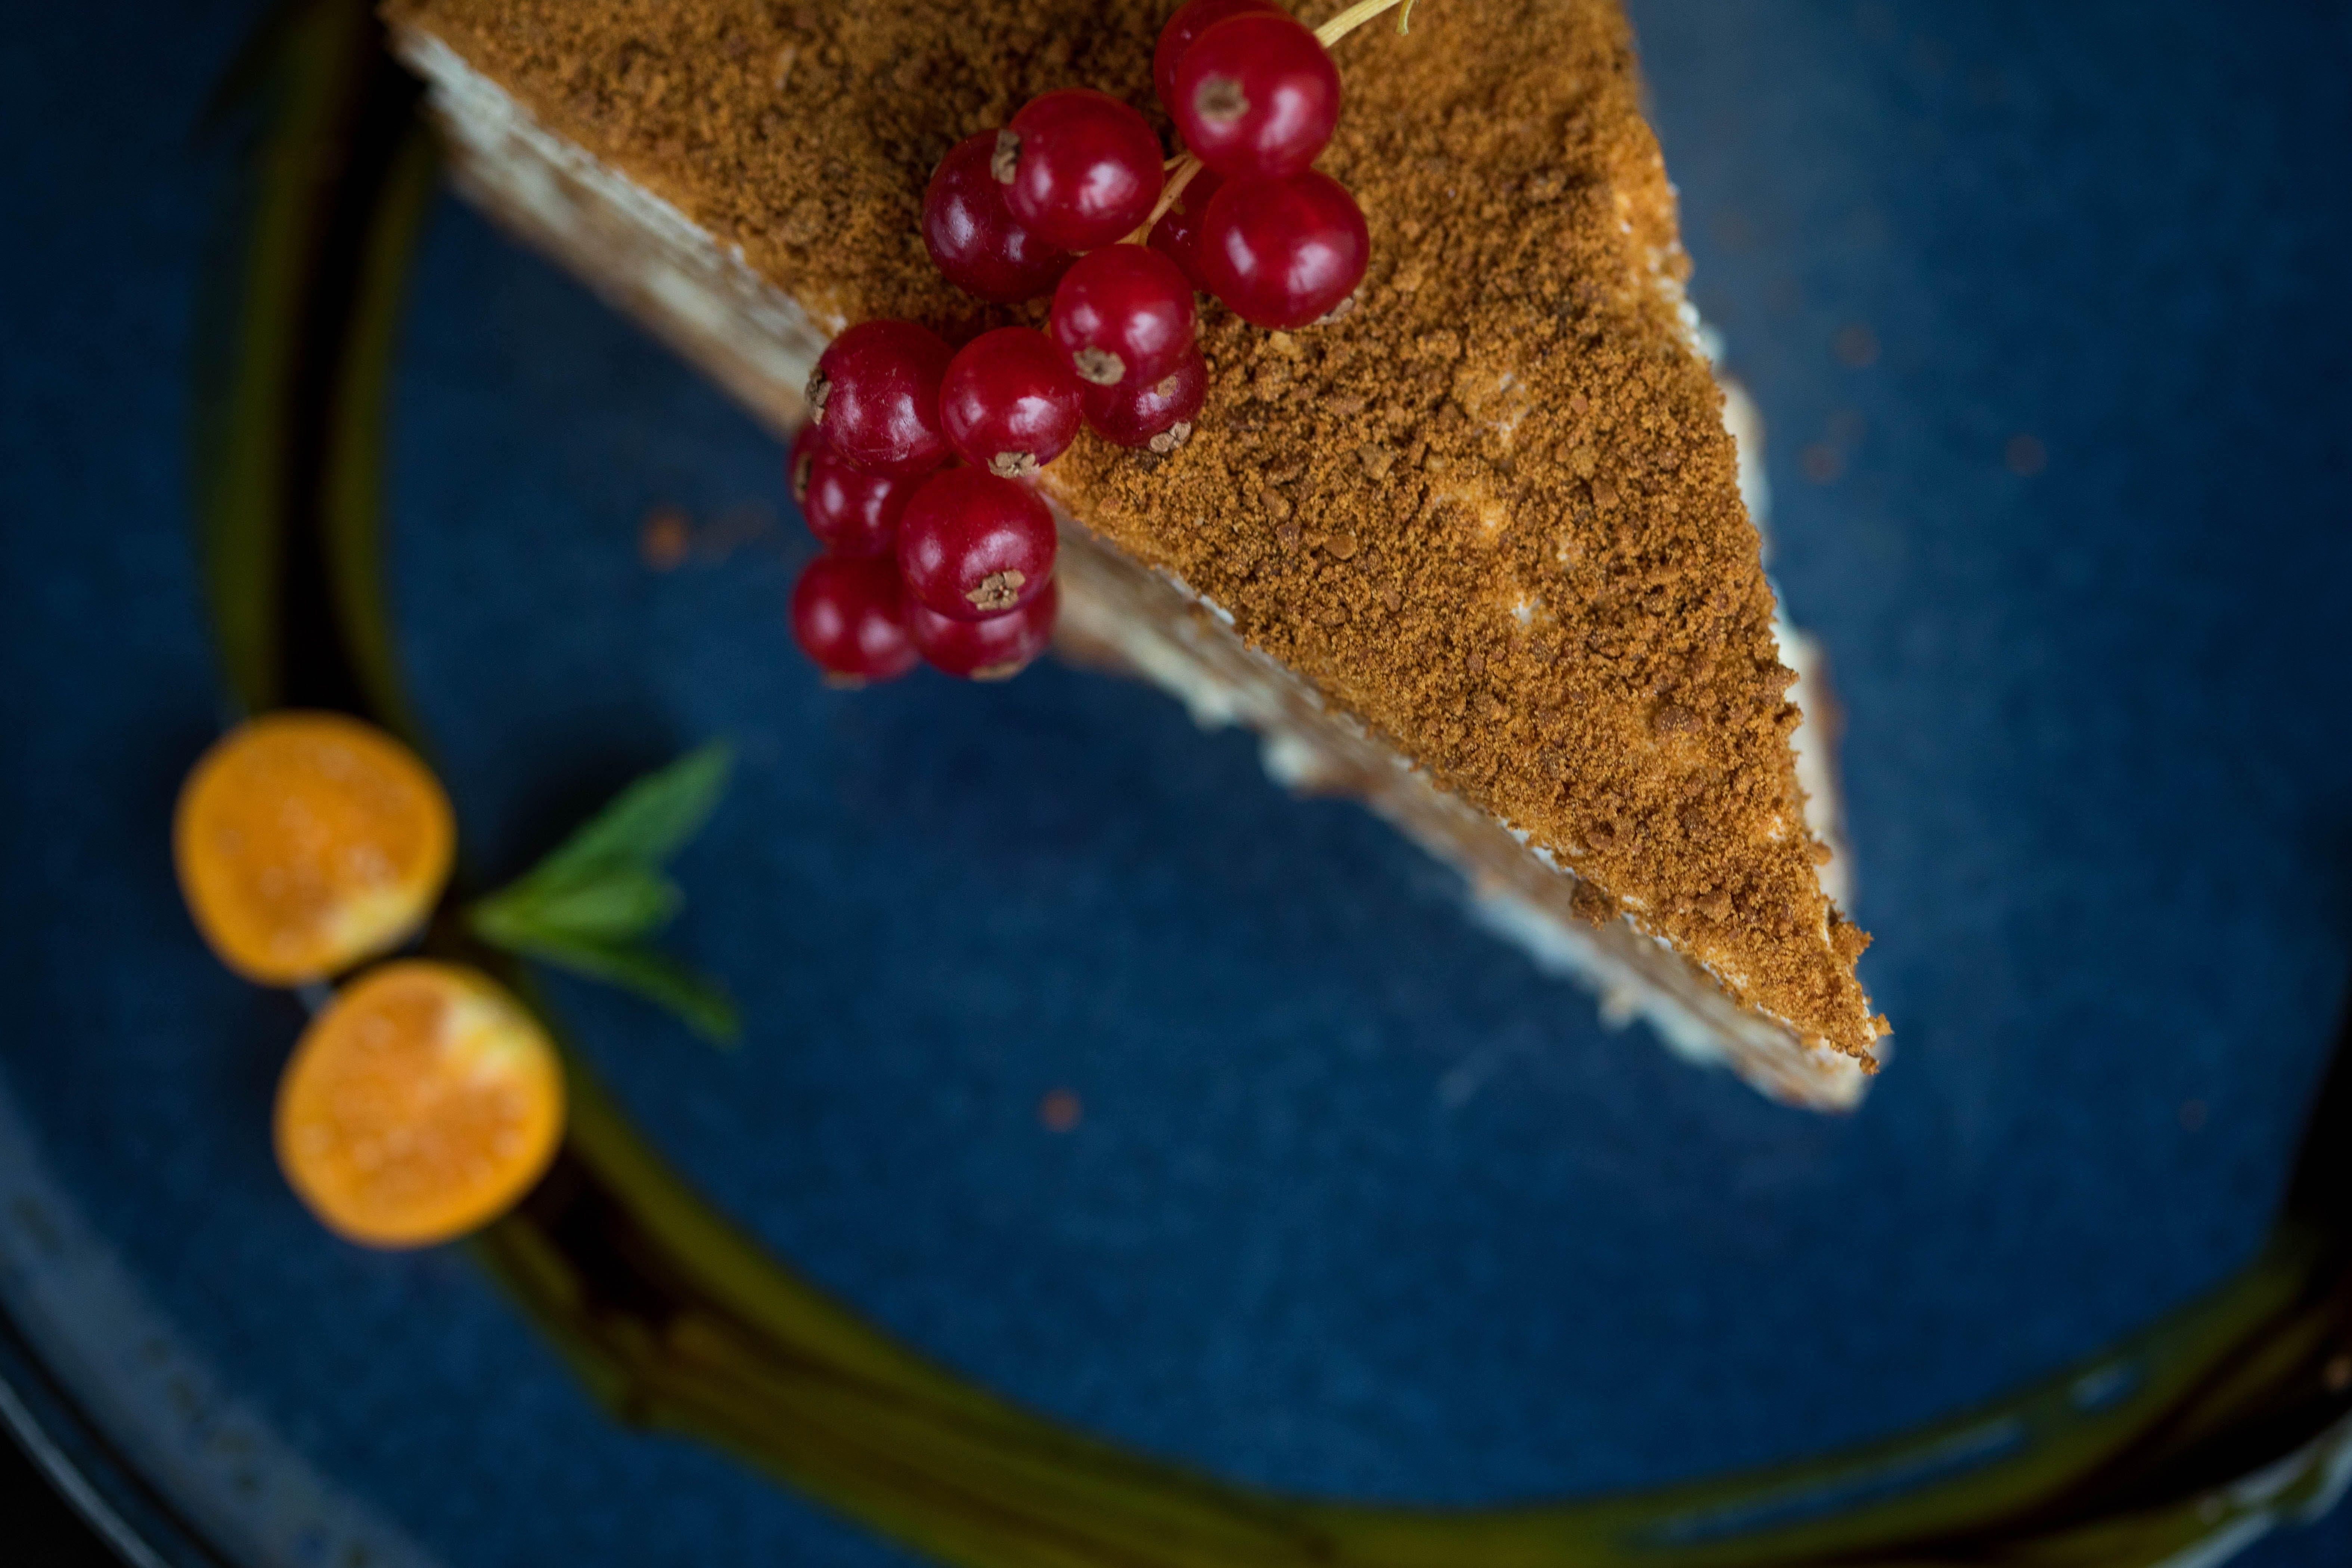 Sliced Cake on Blue Plate